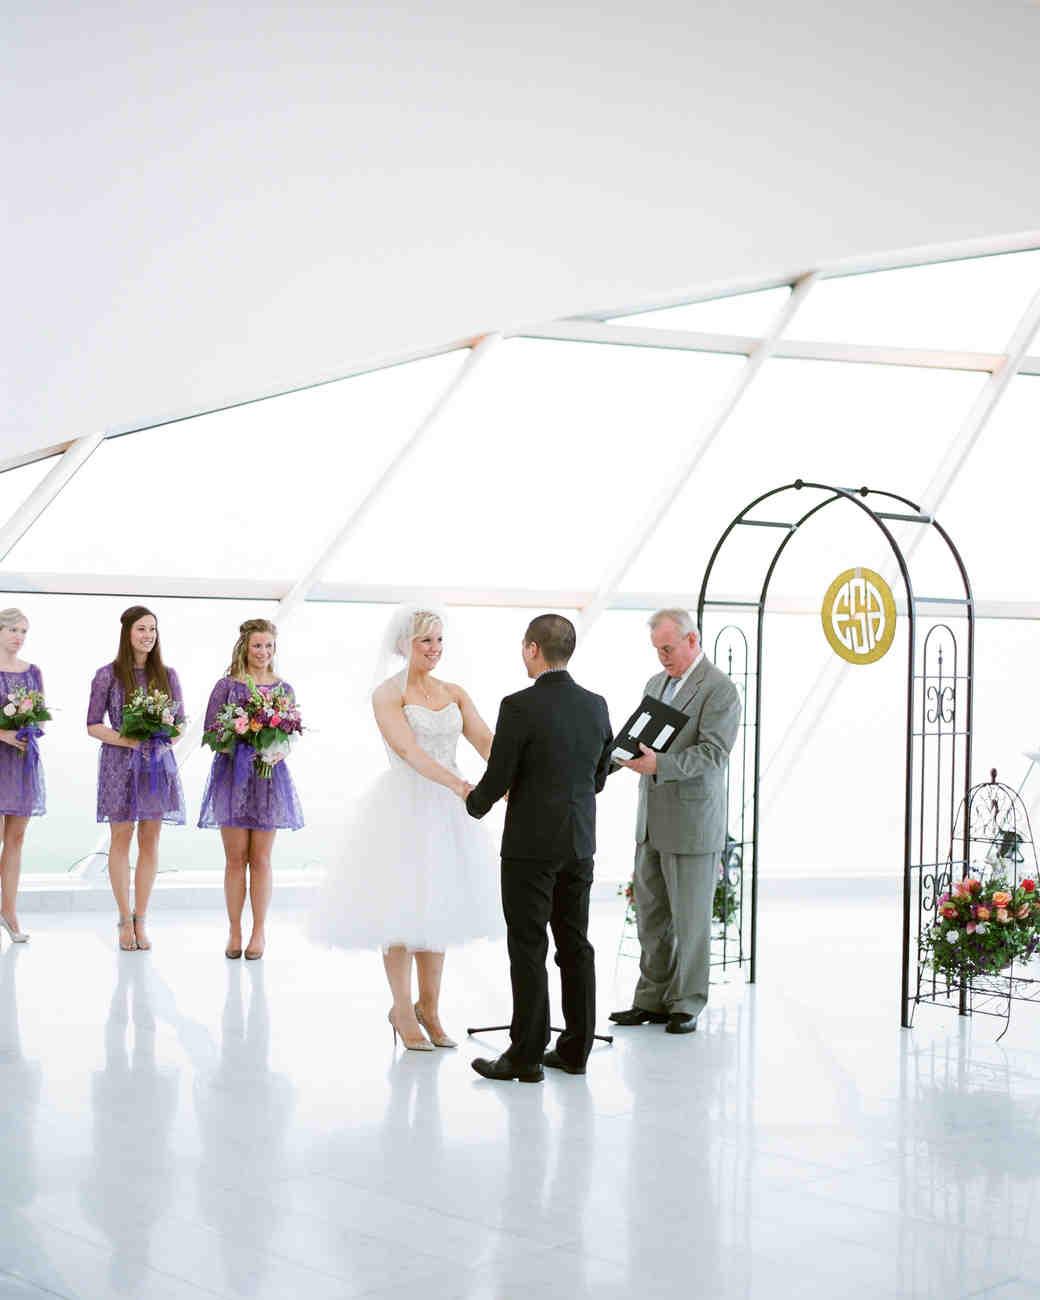 libby-allen-wedding-ceremony-045-s112487-0116.jpg